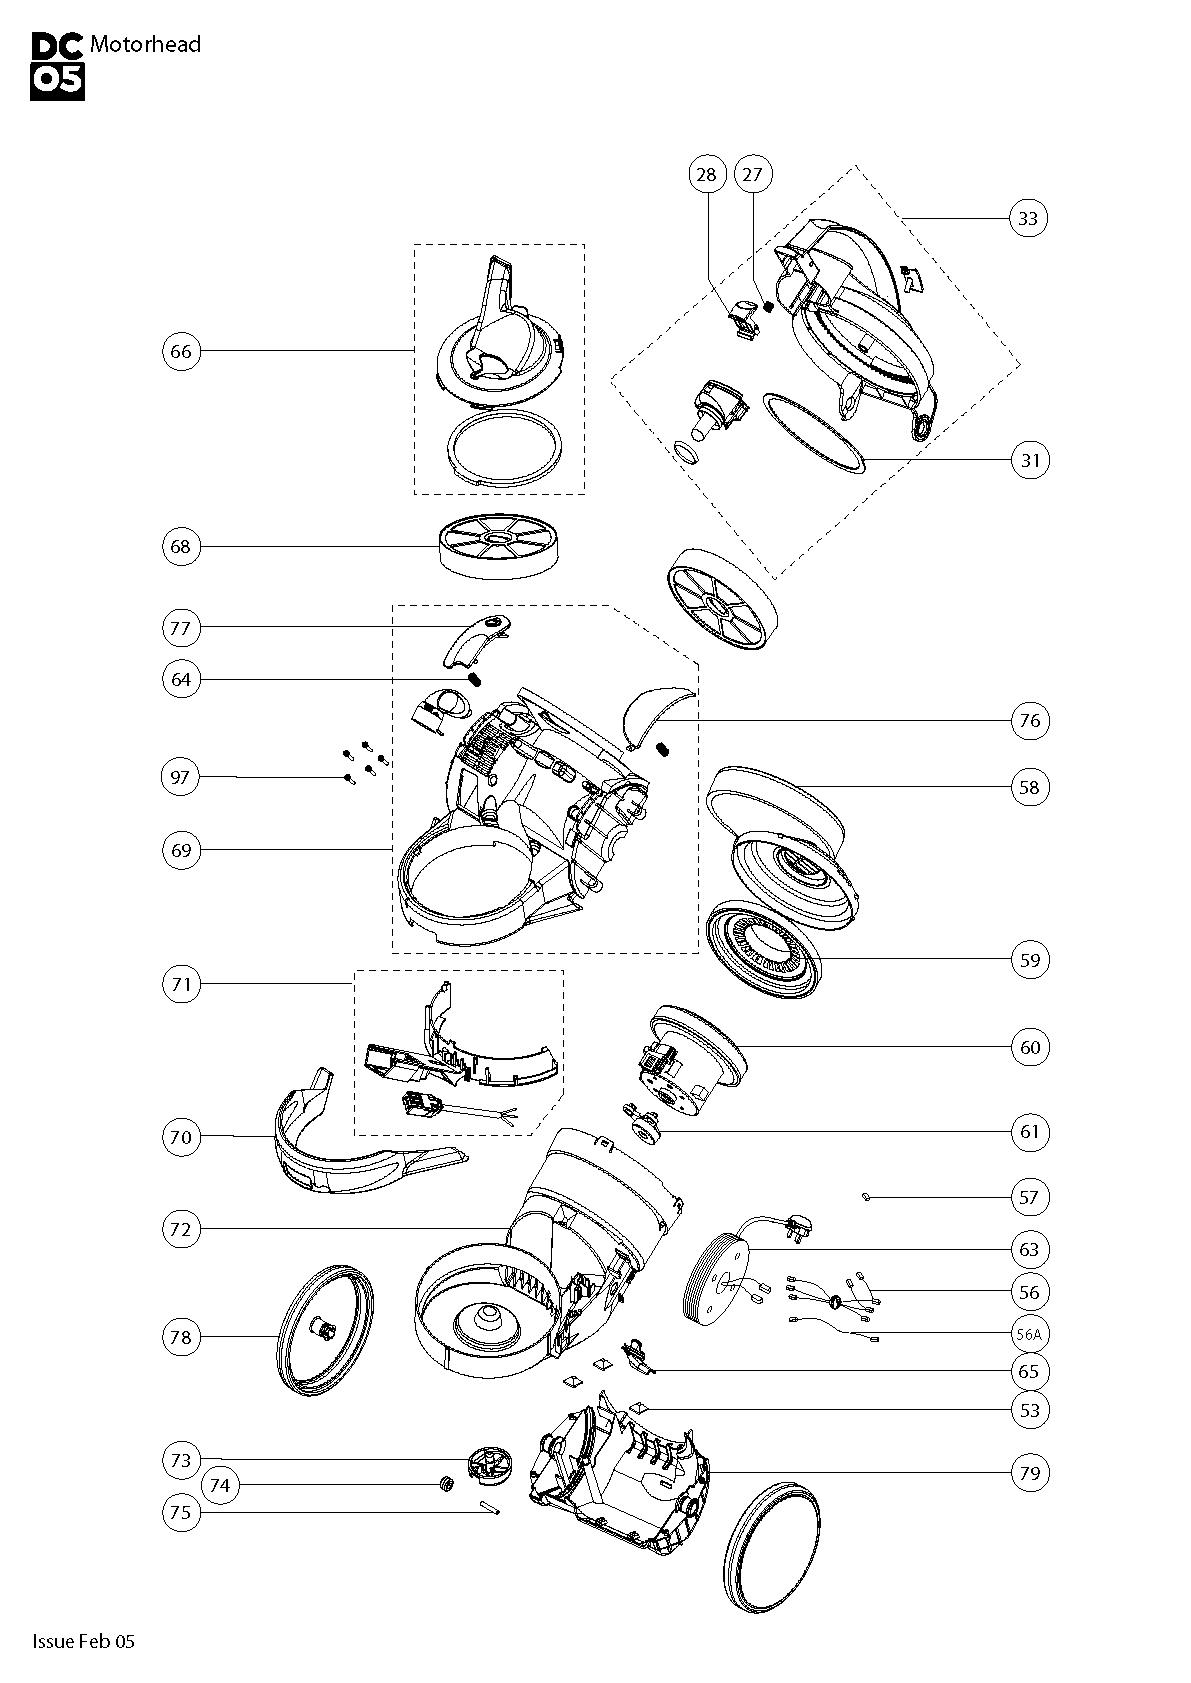 Dyson Dc05 Motorhead Vacuum Cleaner Parts Nintendo Dsi Wiring Diagram